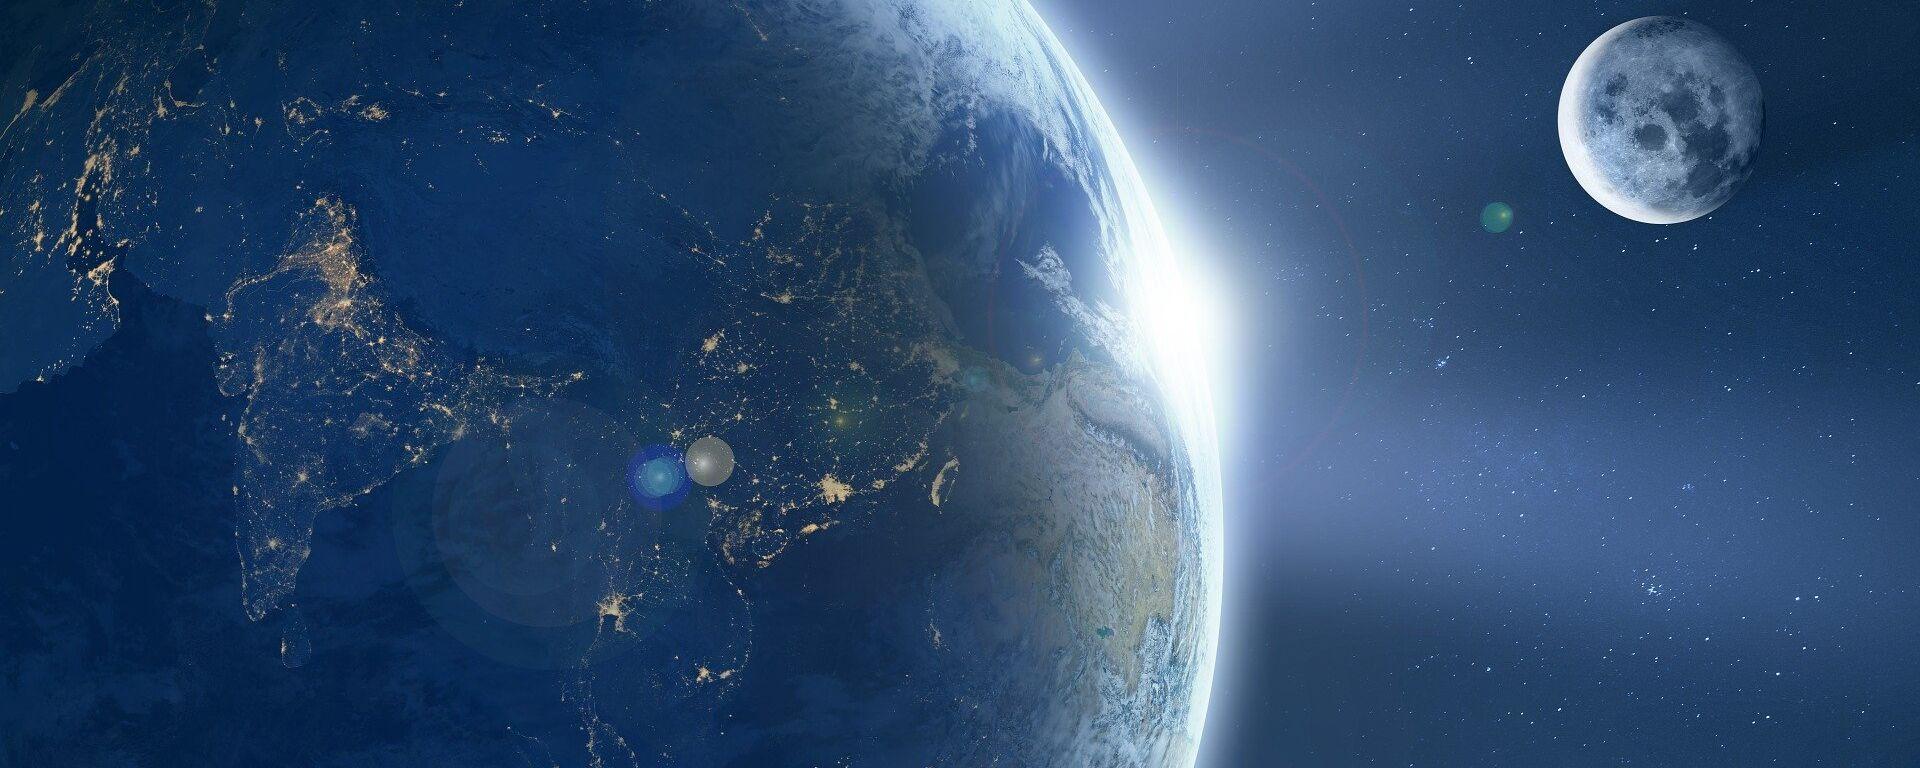 Планета Земля - Sputnik Latvija, 1920, 12.09.2021